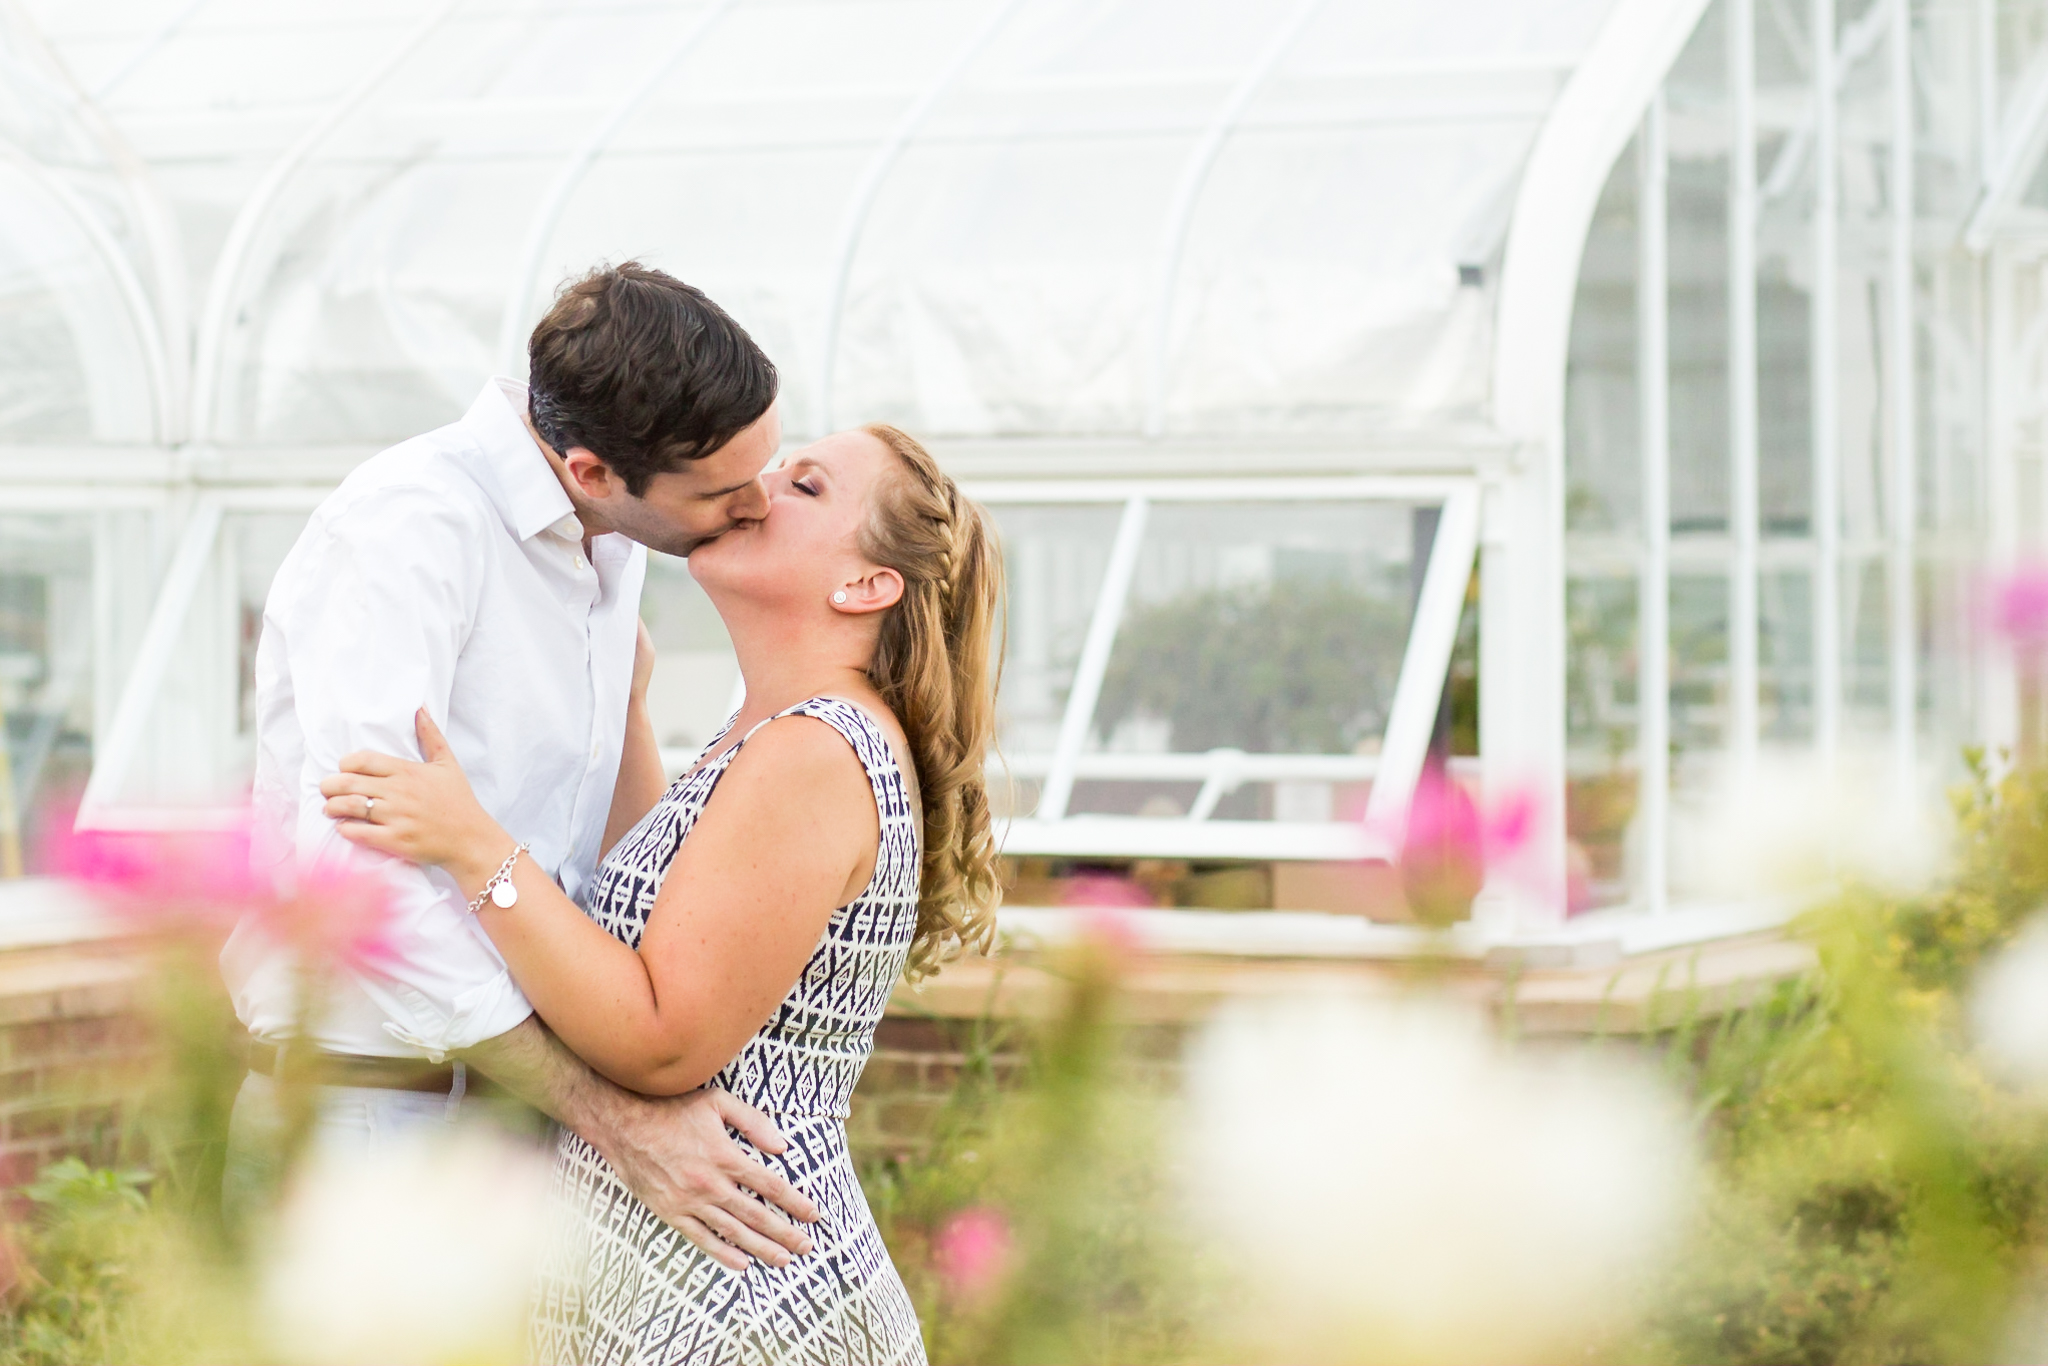 elizabeth-park-rose-garden-engagement-session-hartford-connecticut-wedding-engagement-session-prep-shaina-lee-photography-photo